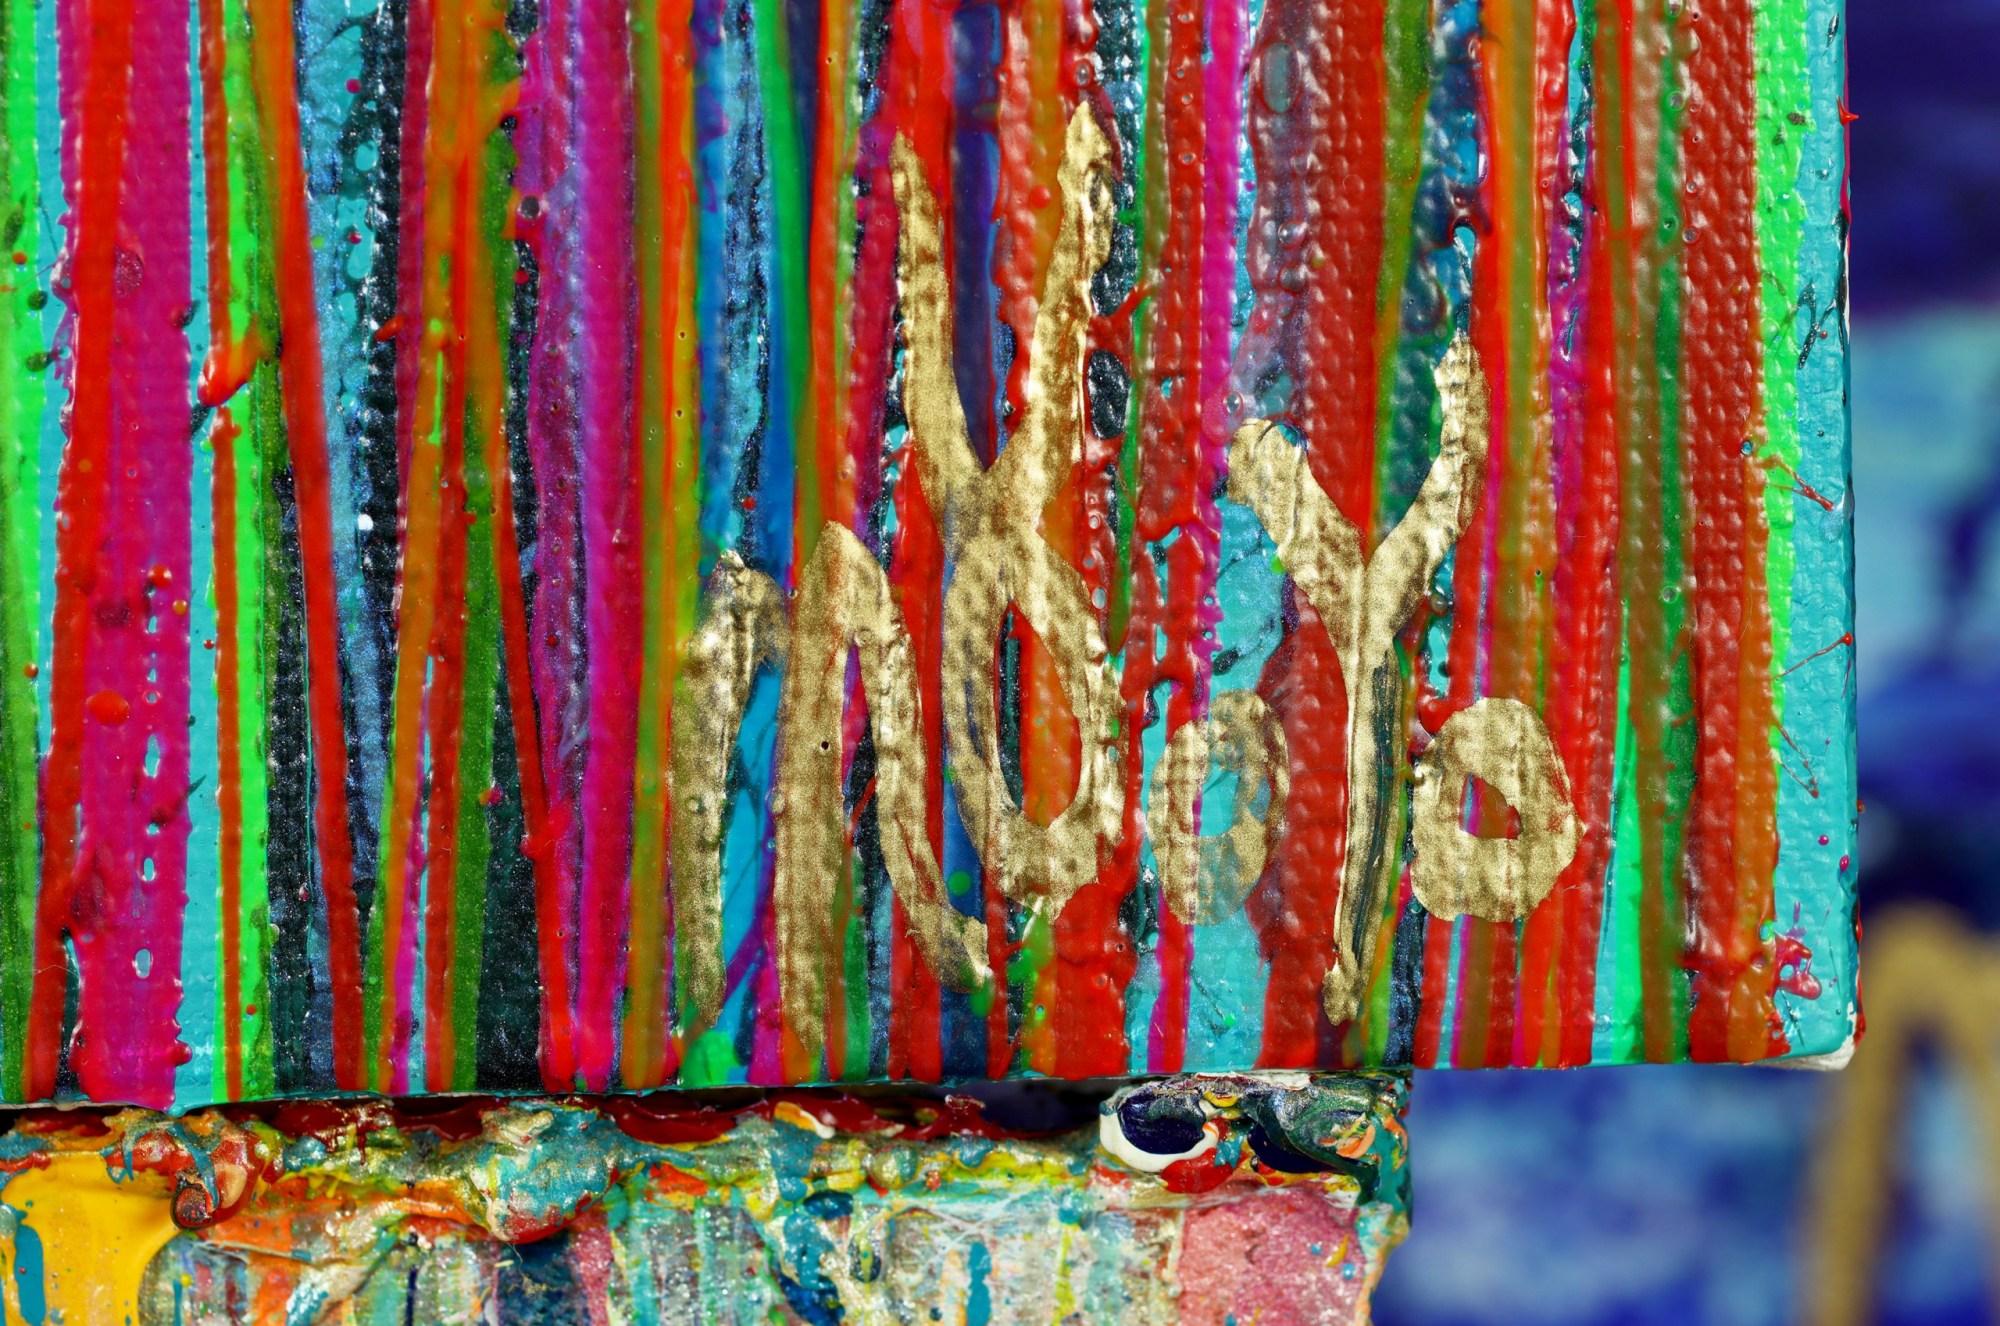 SIGNATURE / Caribbean Reflections 6 (2021) / Artist: Nestor Toro